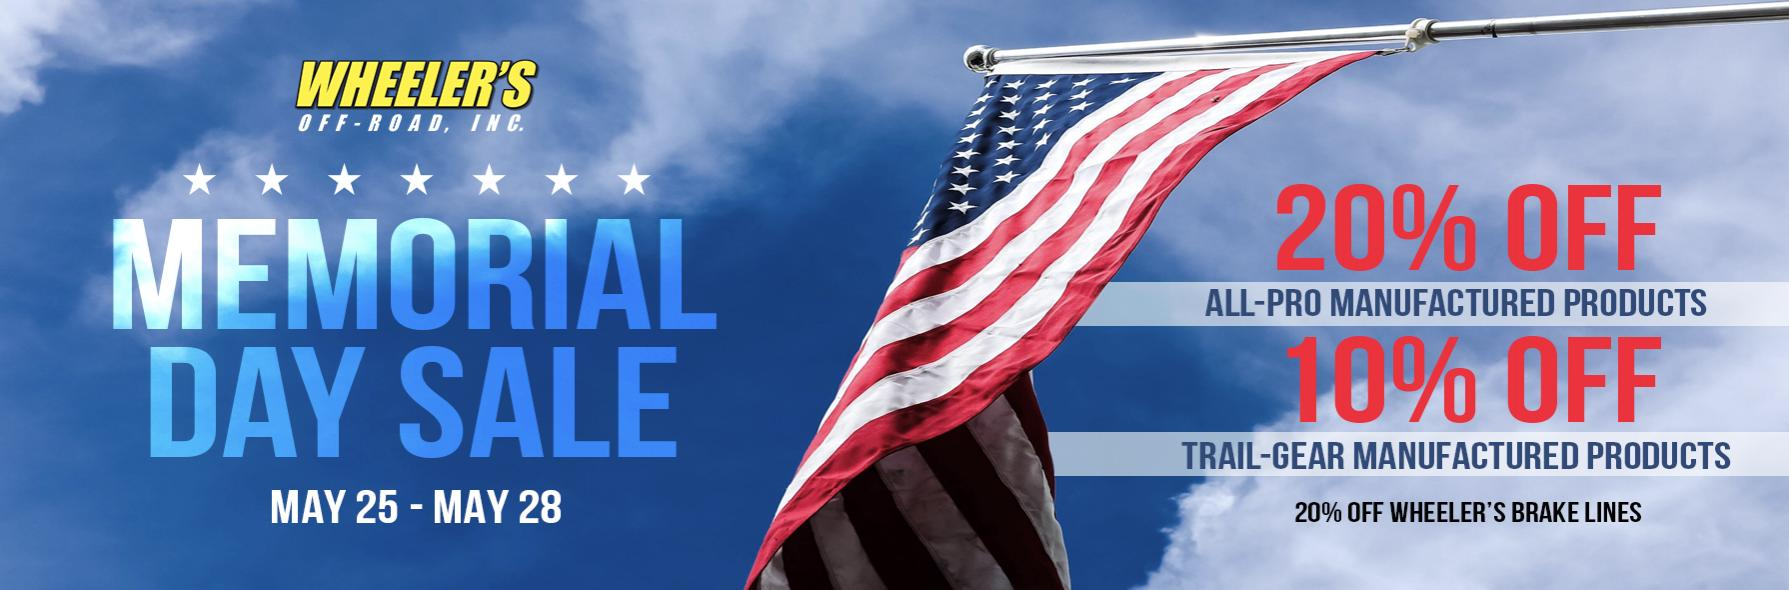 Wheeler's Memorial Day Sale-wor-jpg